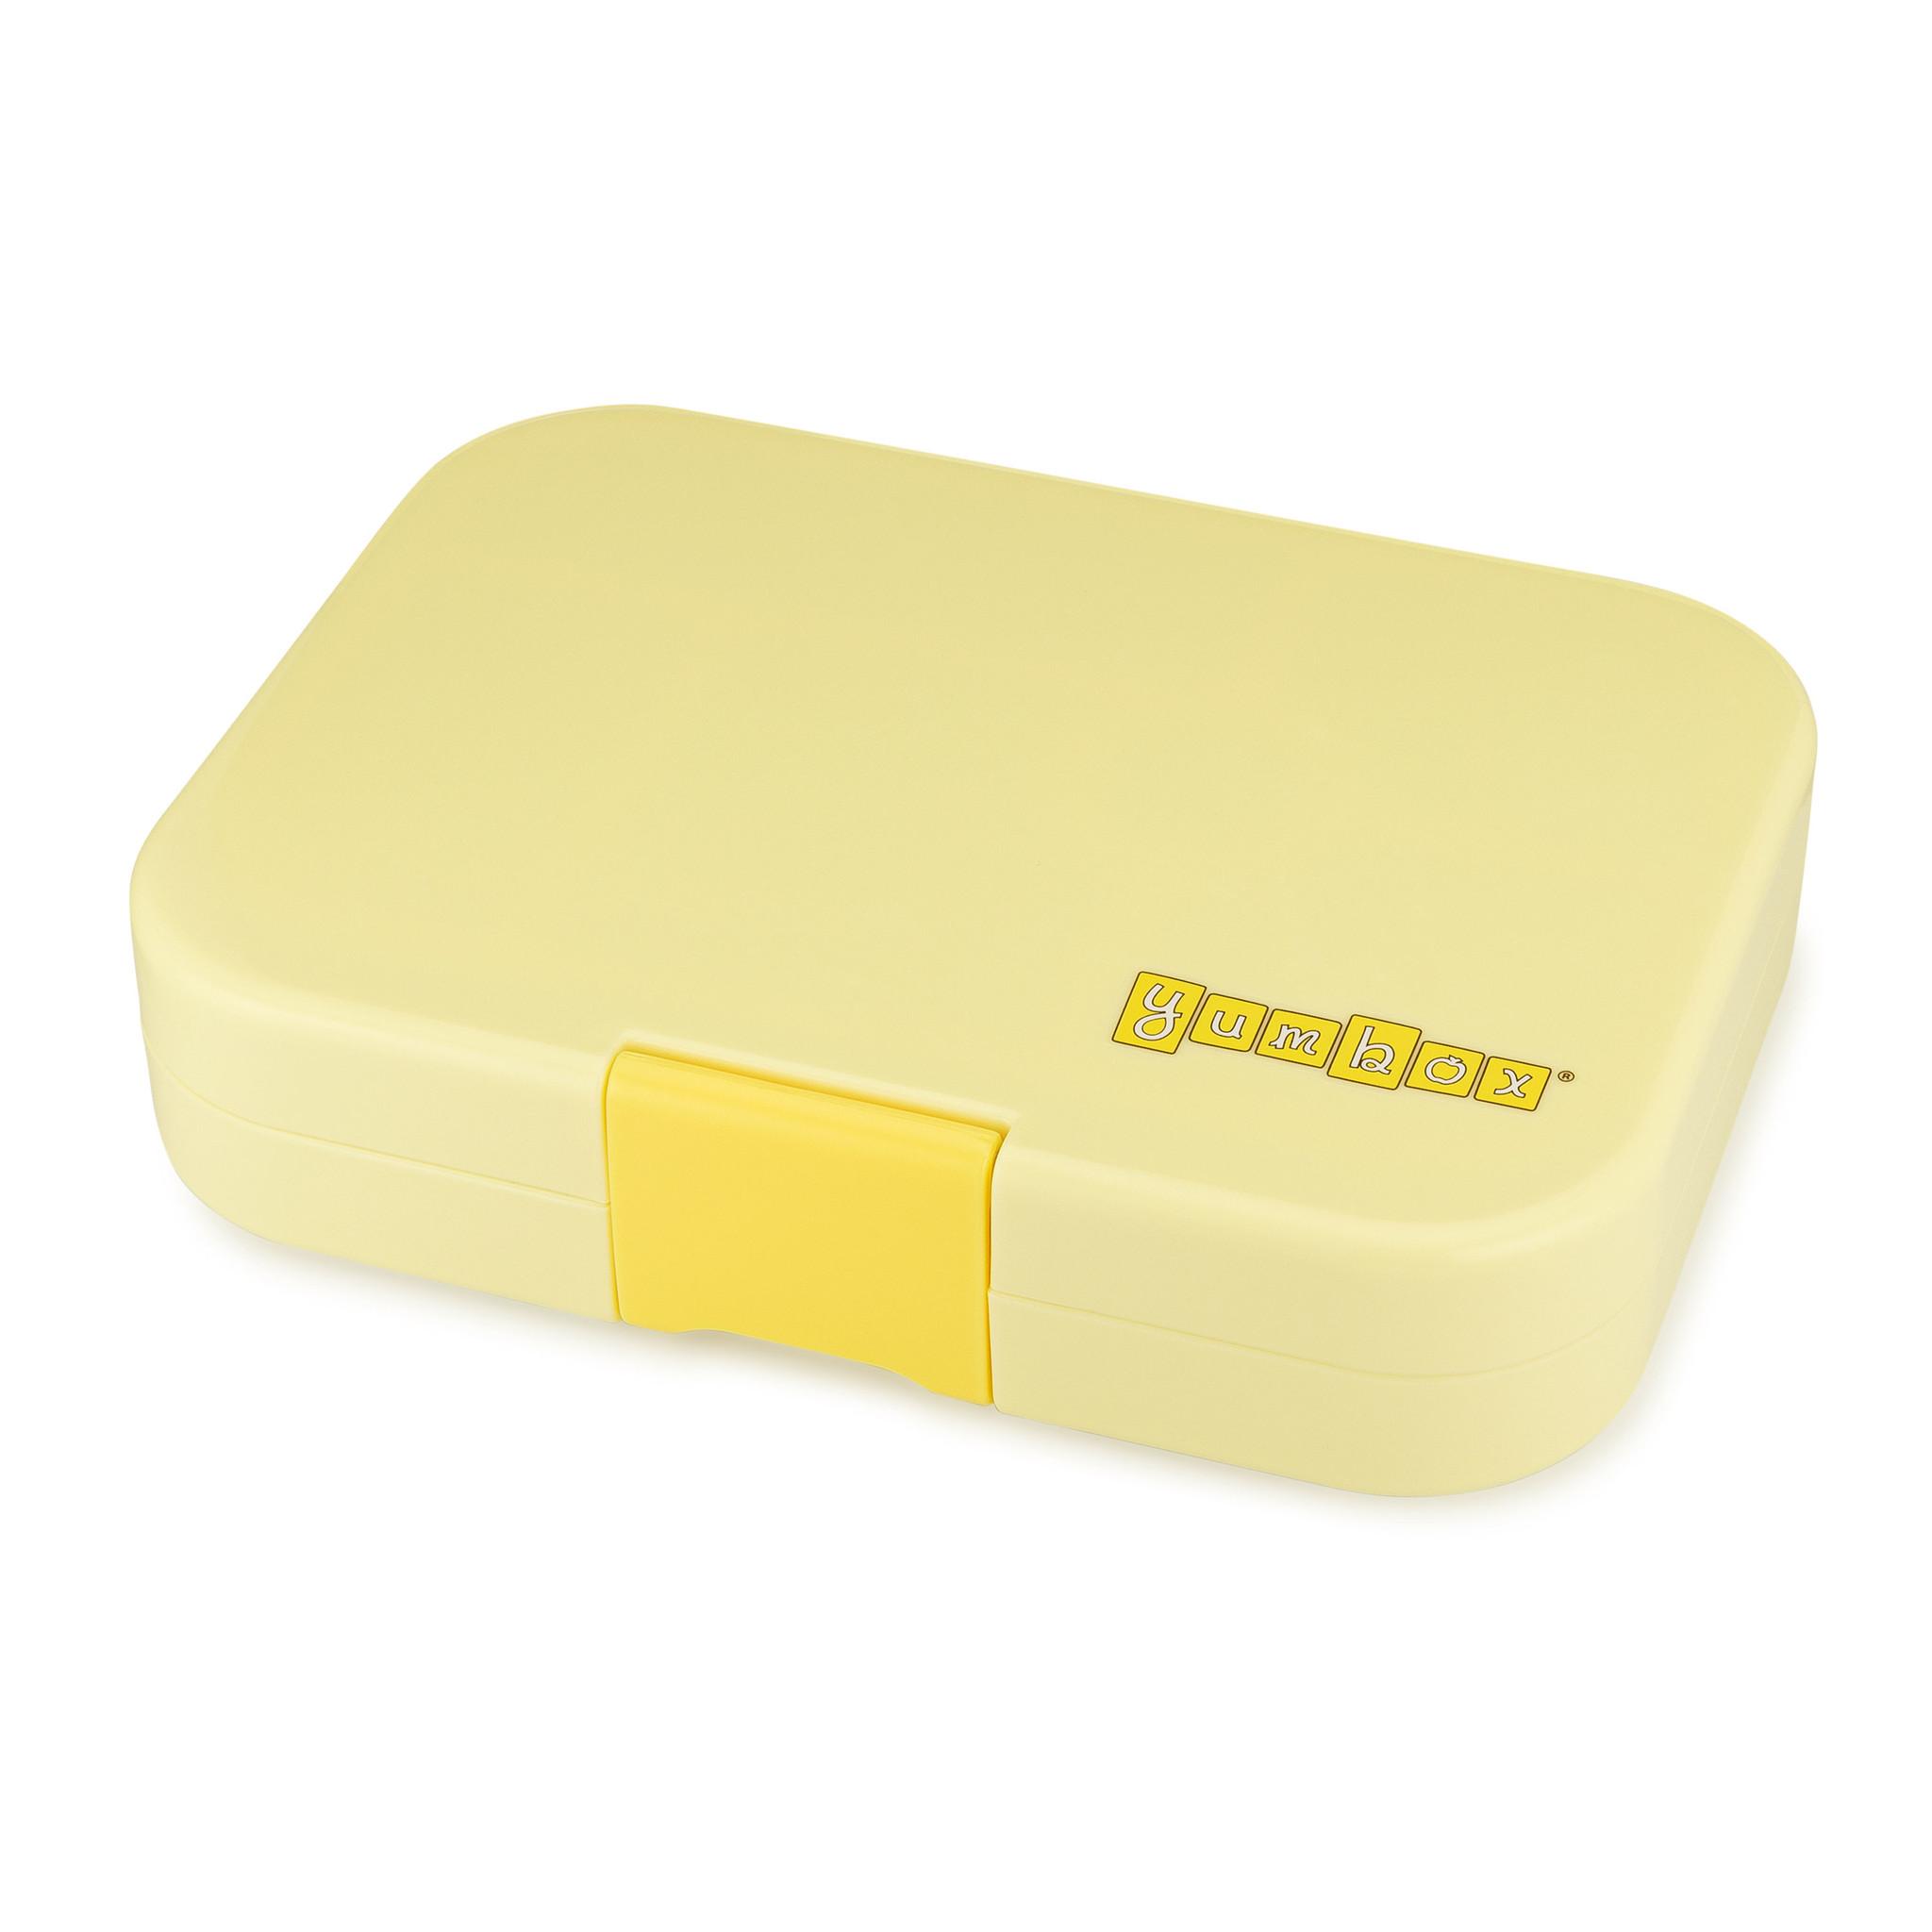 Yumbox Original 6-sections Sunburst yellow / Paradise tray-3